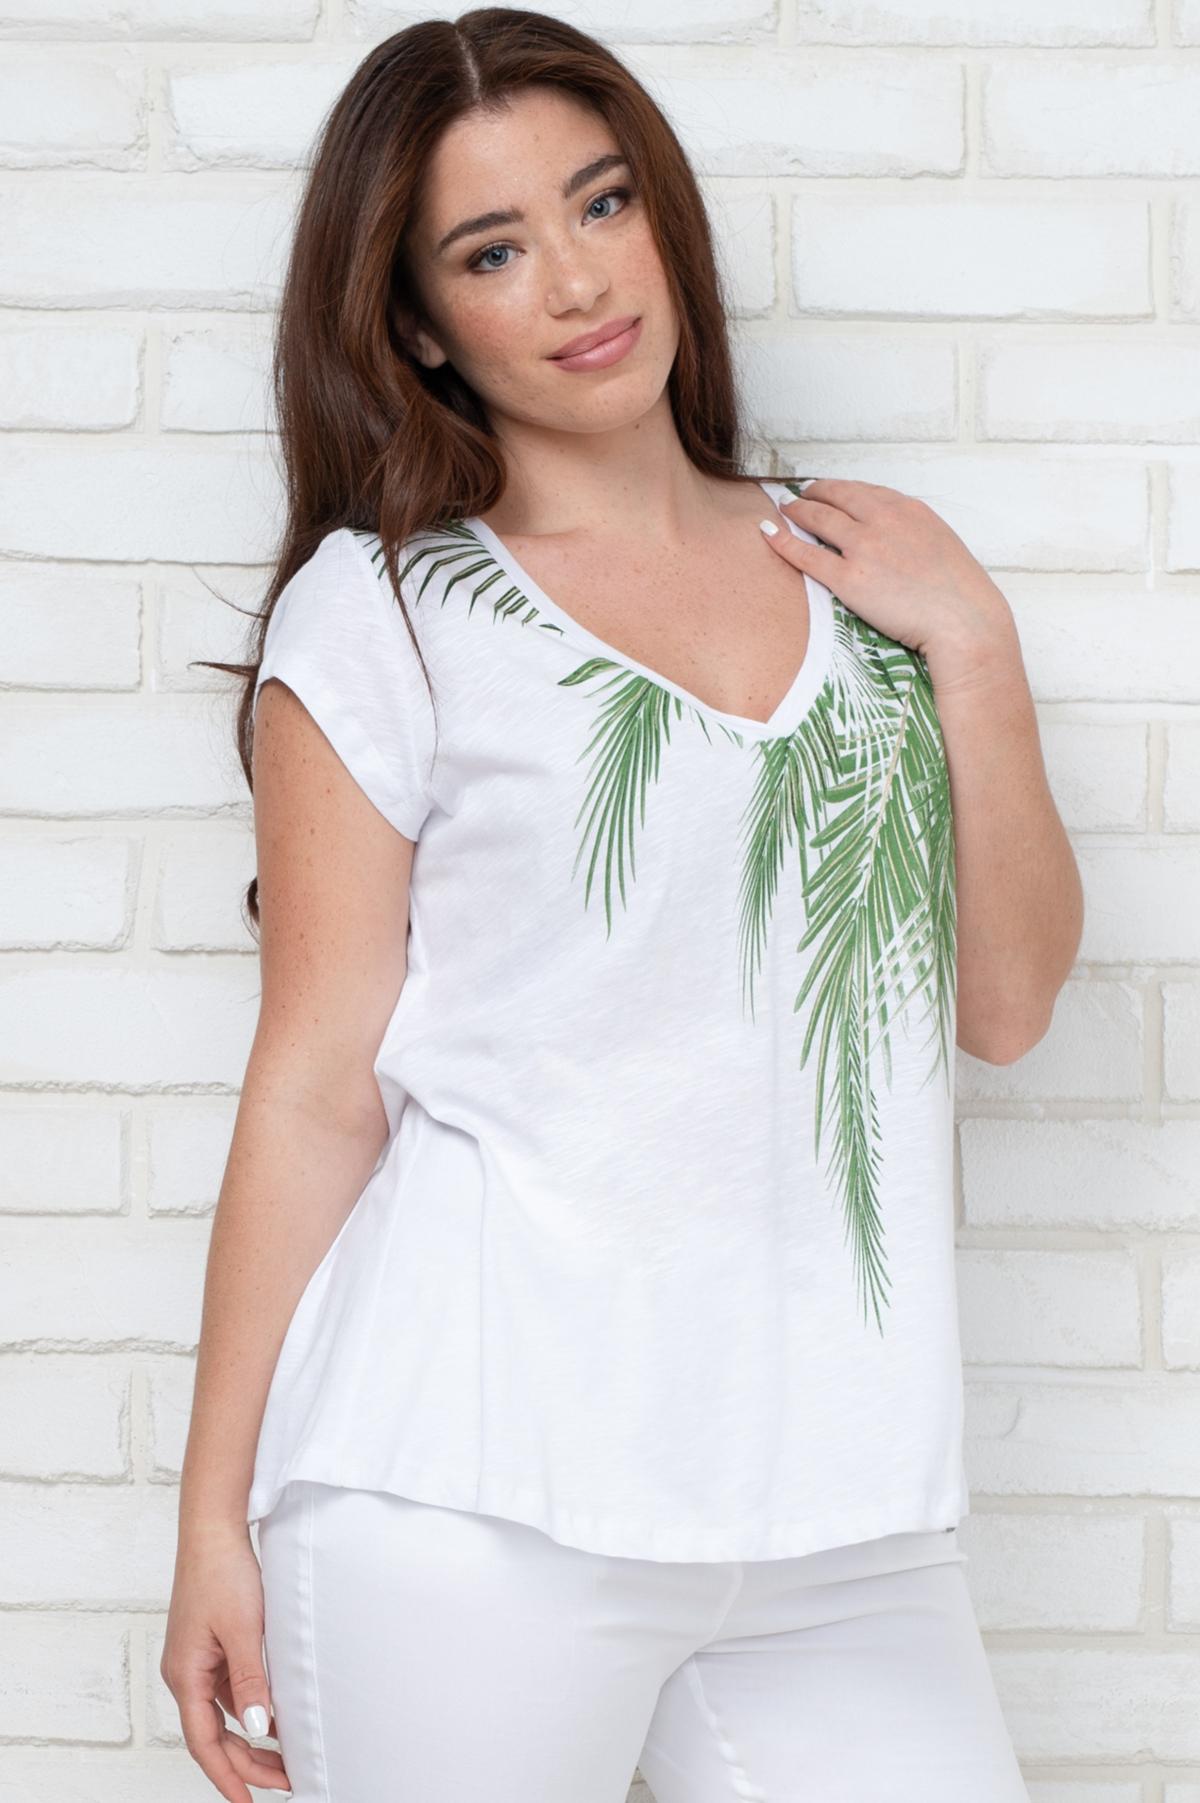 0e8b338592f ΜΠΛΟΥΖΑ ΜΕ ΚΟΝΤΟ ΜΑΝΙΚΙ - Real Lady - Shop Online